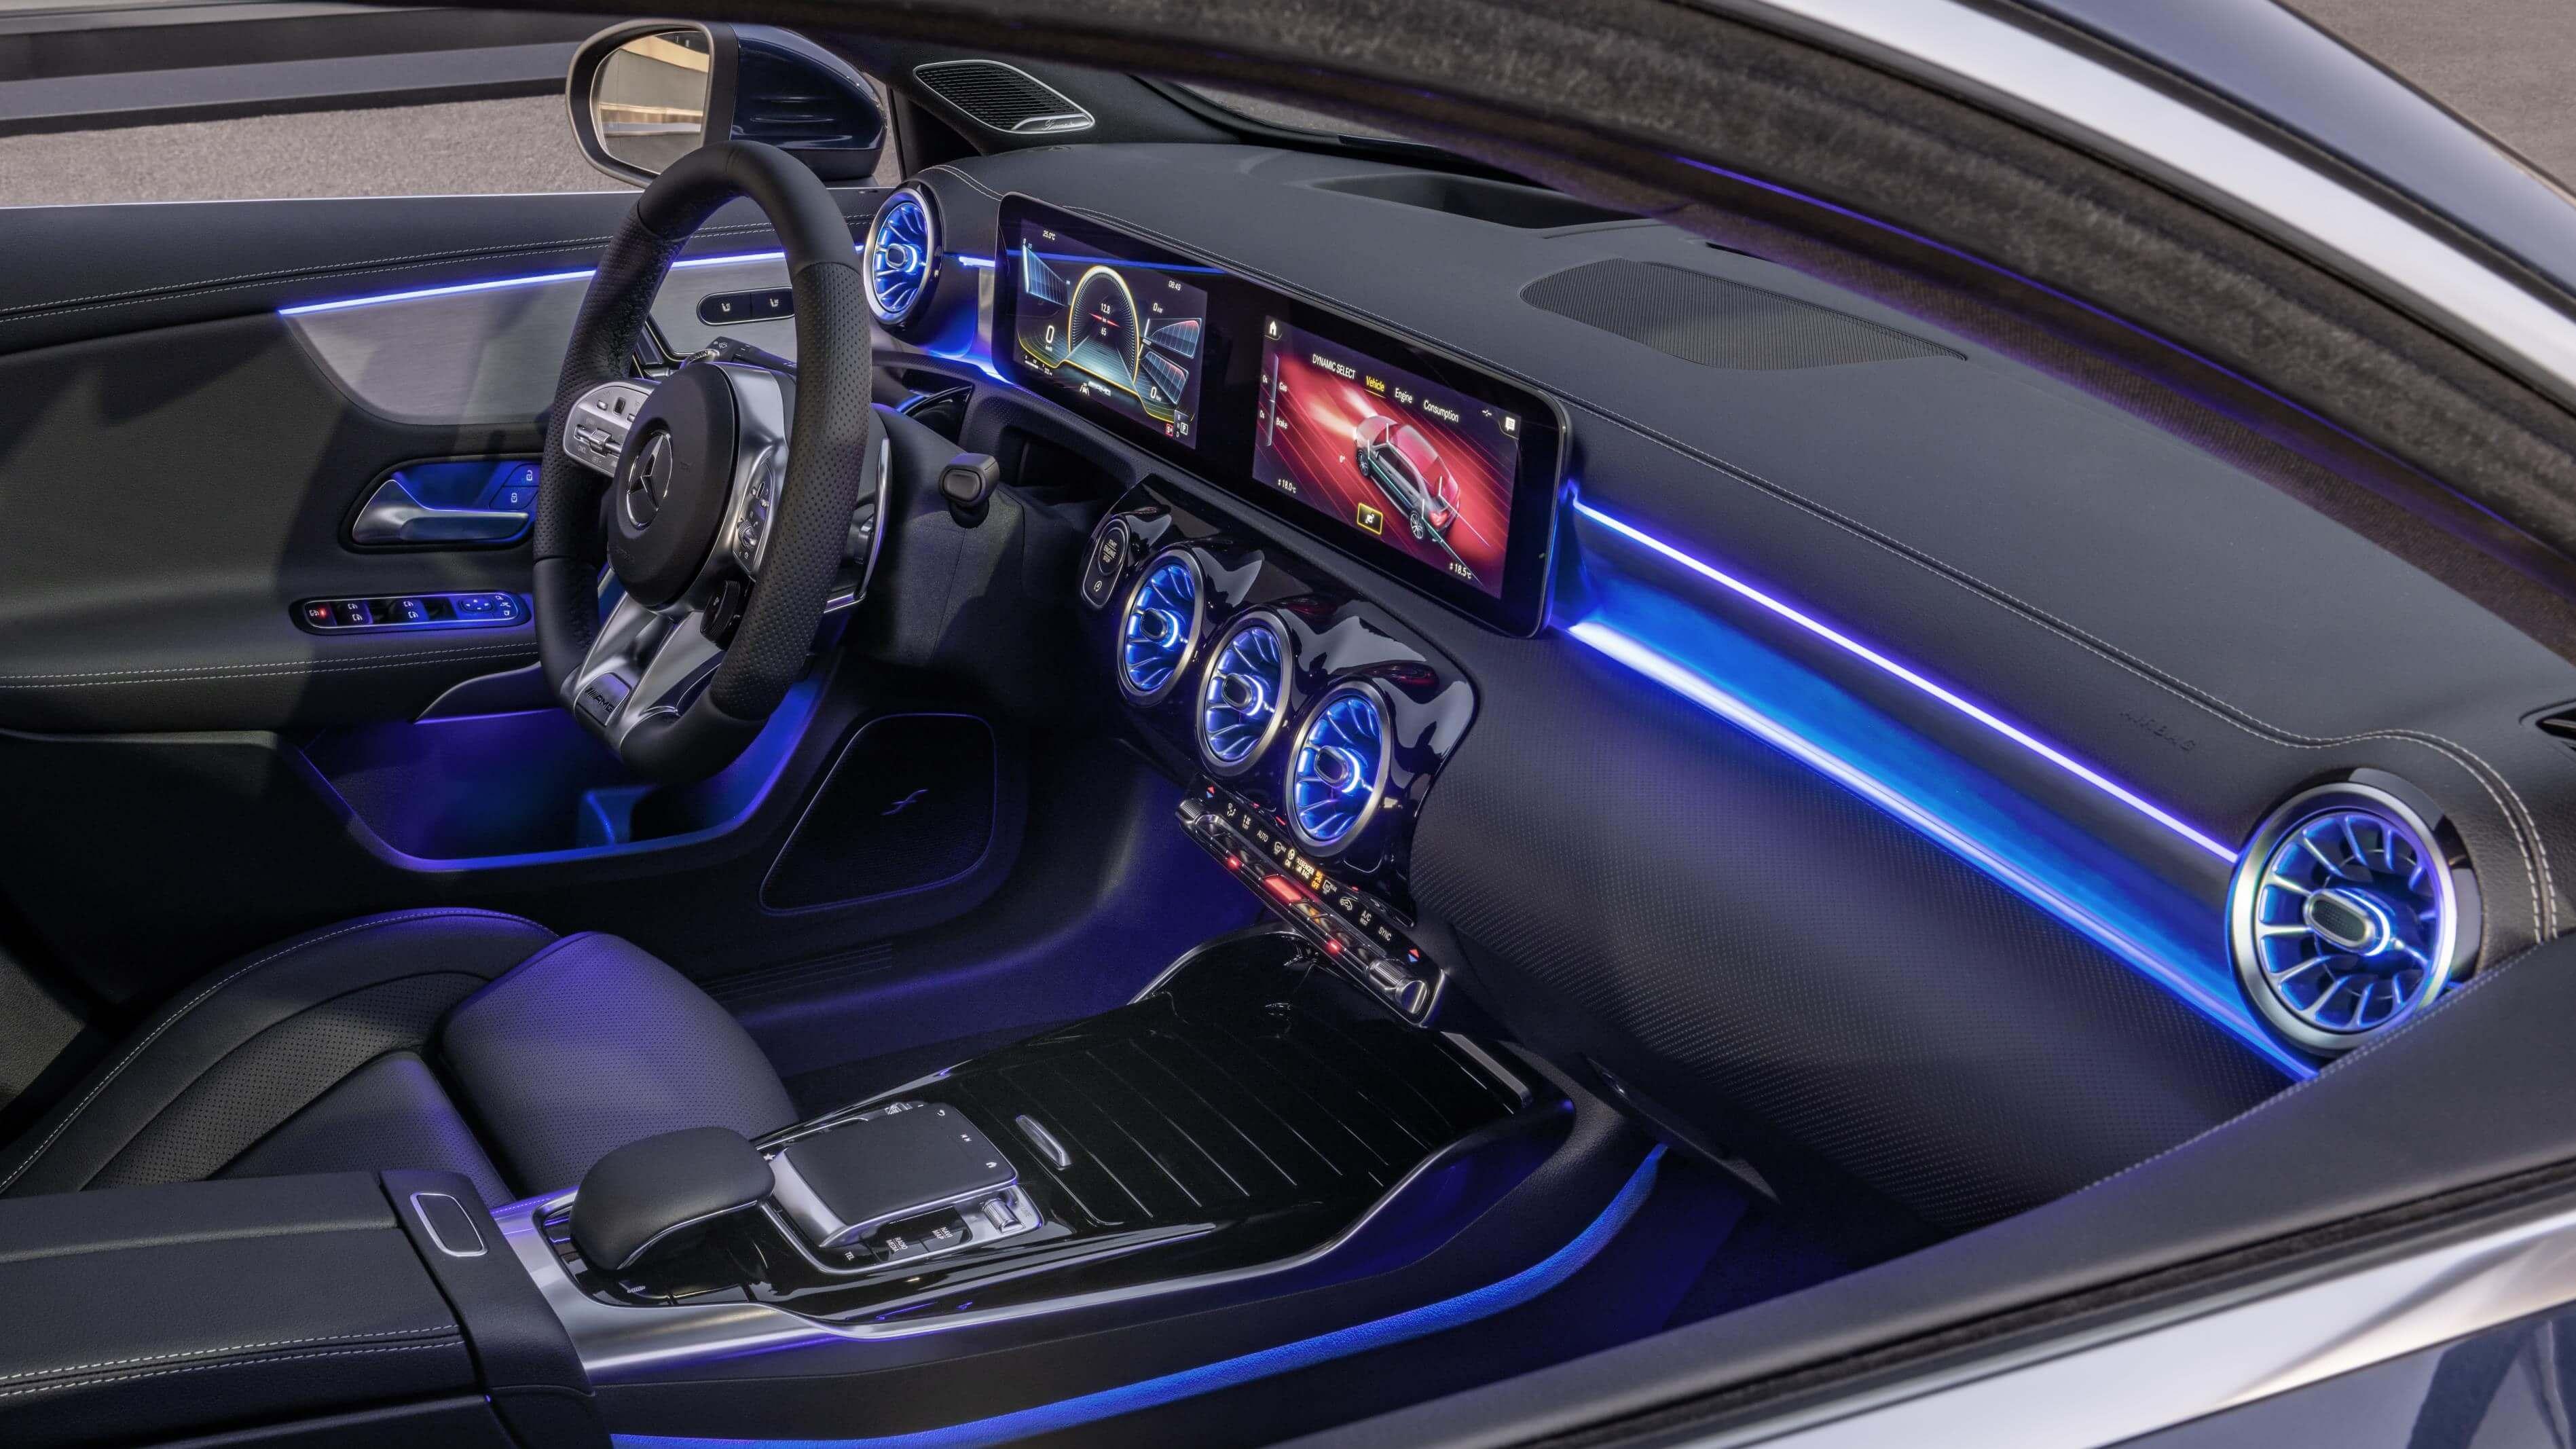 Mercedes-AMG A 35 4MATIC Sedán: interior